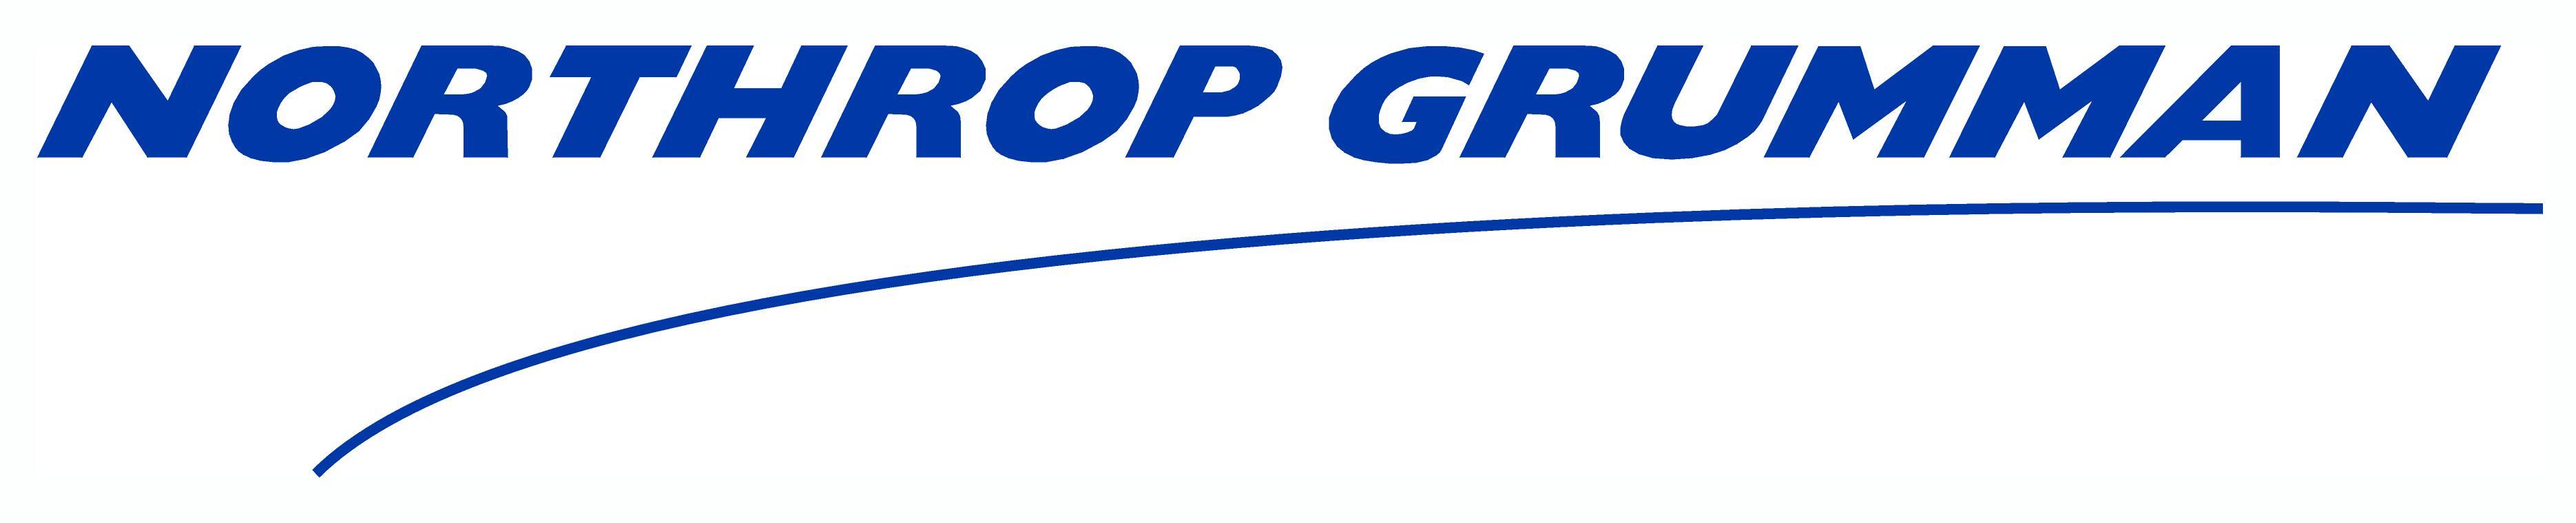 Pinnacle Client - Northrop Grumman